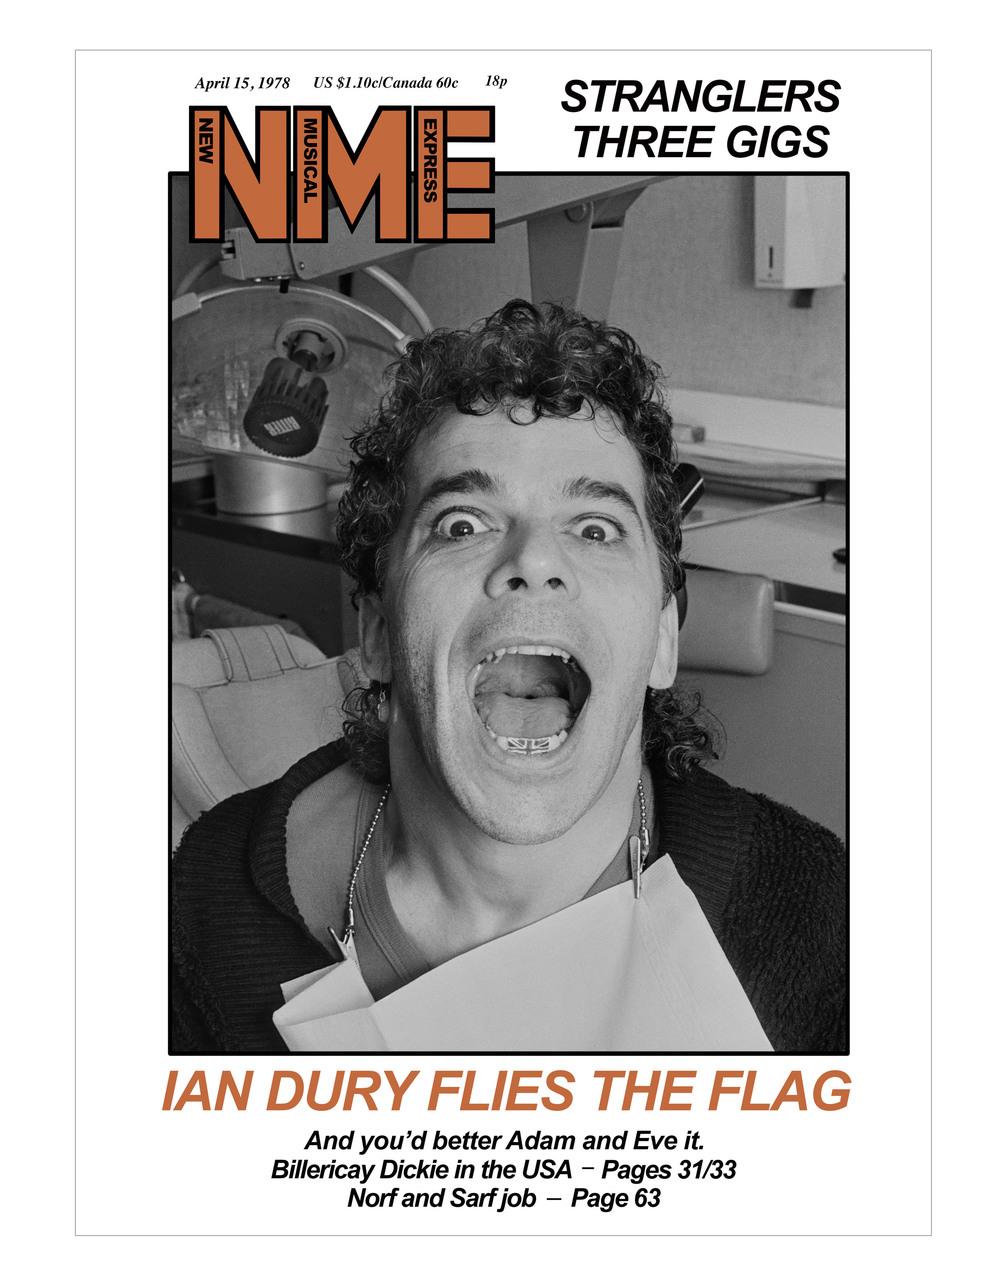 Ian Dury NME cover 2 catalog.jpg